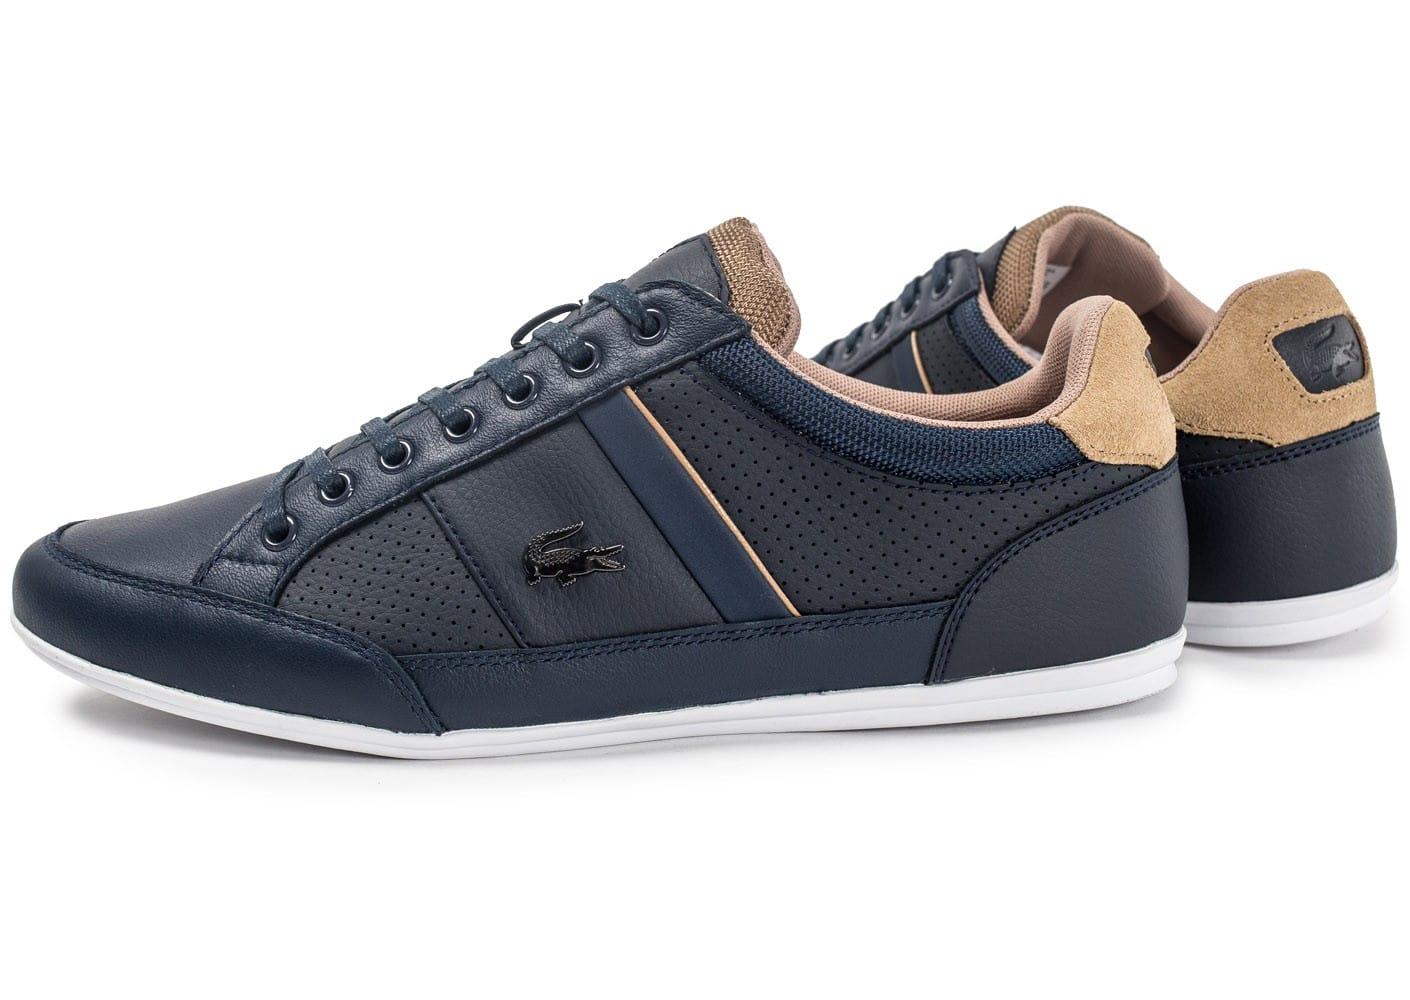 4379035abb Chaussures Homme | Lacoste L.Ight 117 1 Spm Bleu Marine M49n2 une plus  grande image -32% Lacoste Baskets basses Carnaby Homme Blanc et vert  gl19383a